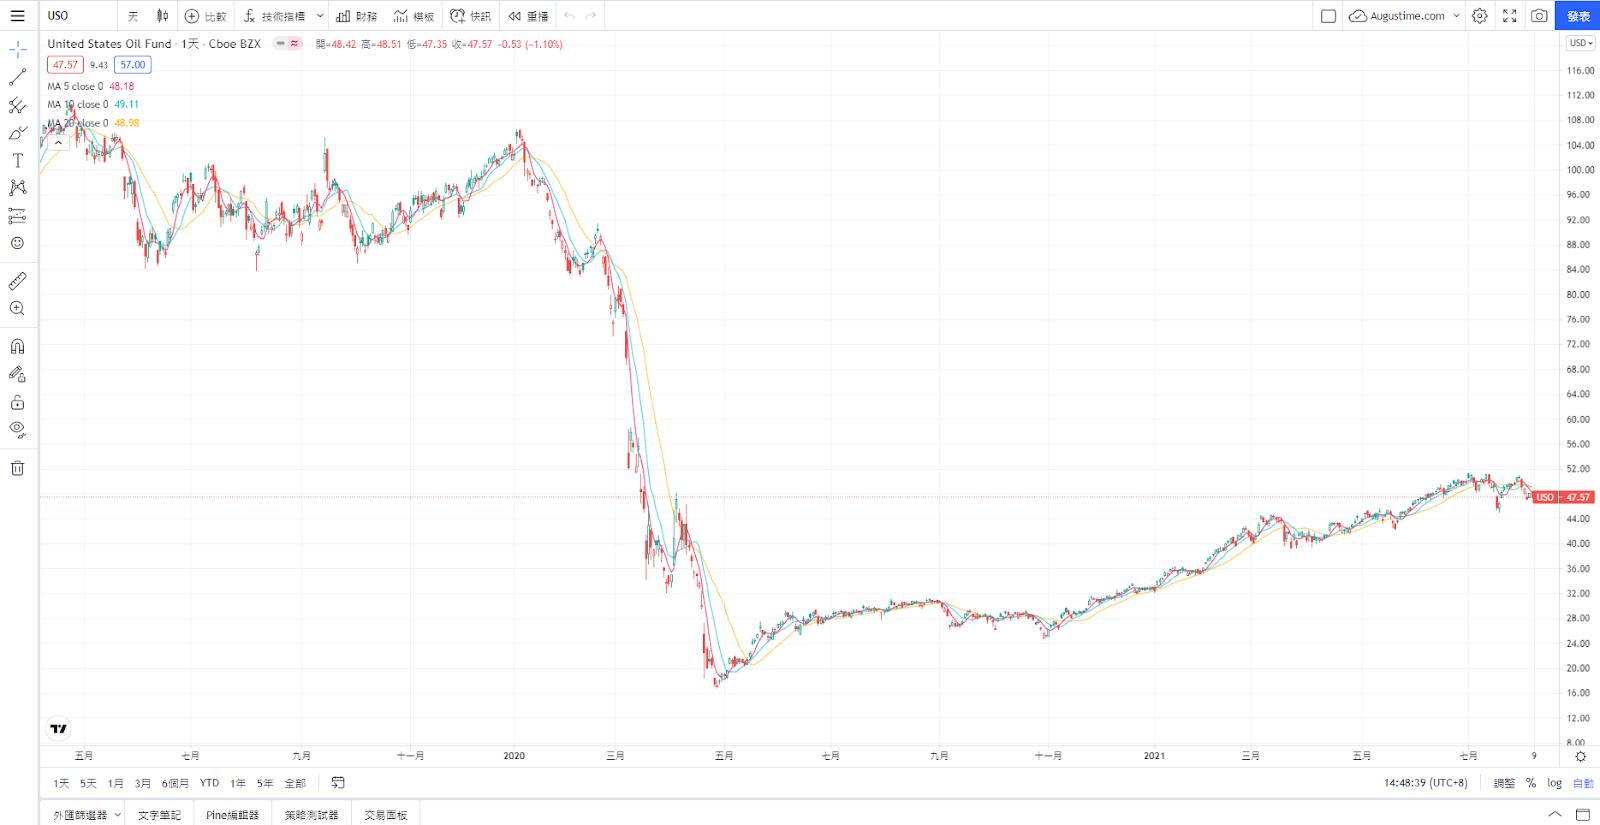 USO,美股USO,USO stock,USO ETF,USO成分股,USO持股,USO配息,USO除息,USO股價,USO介紹